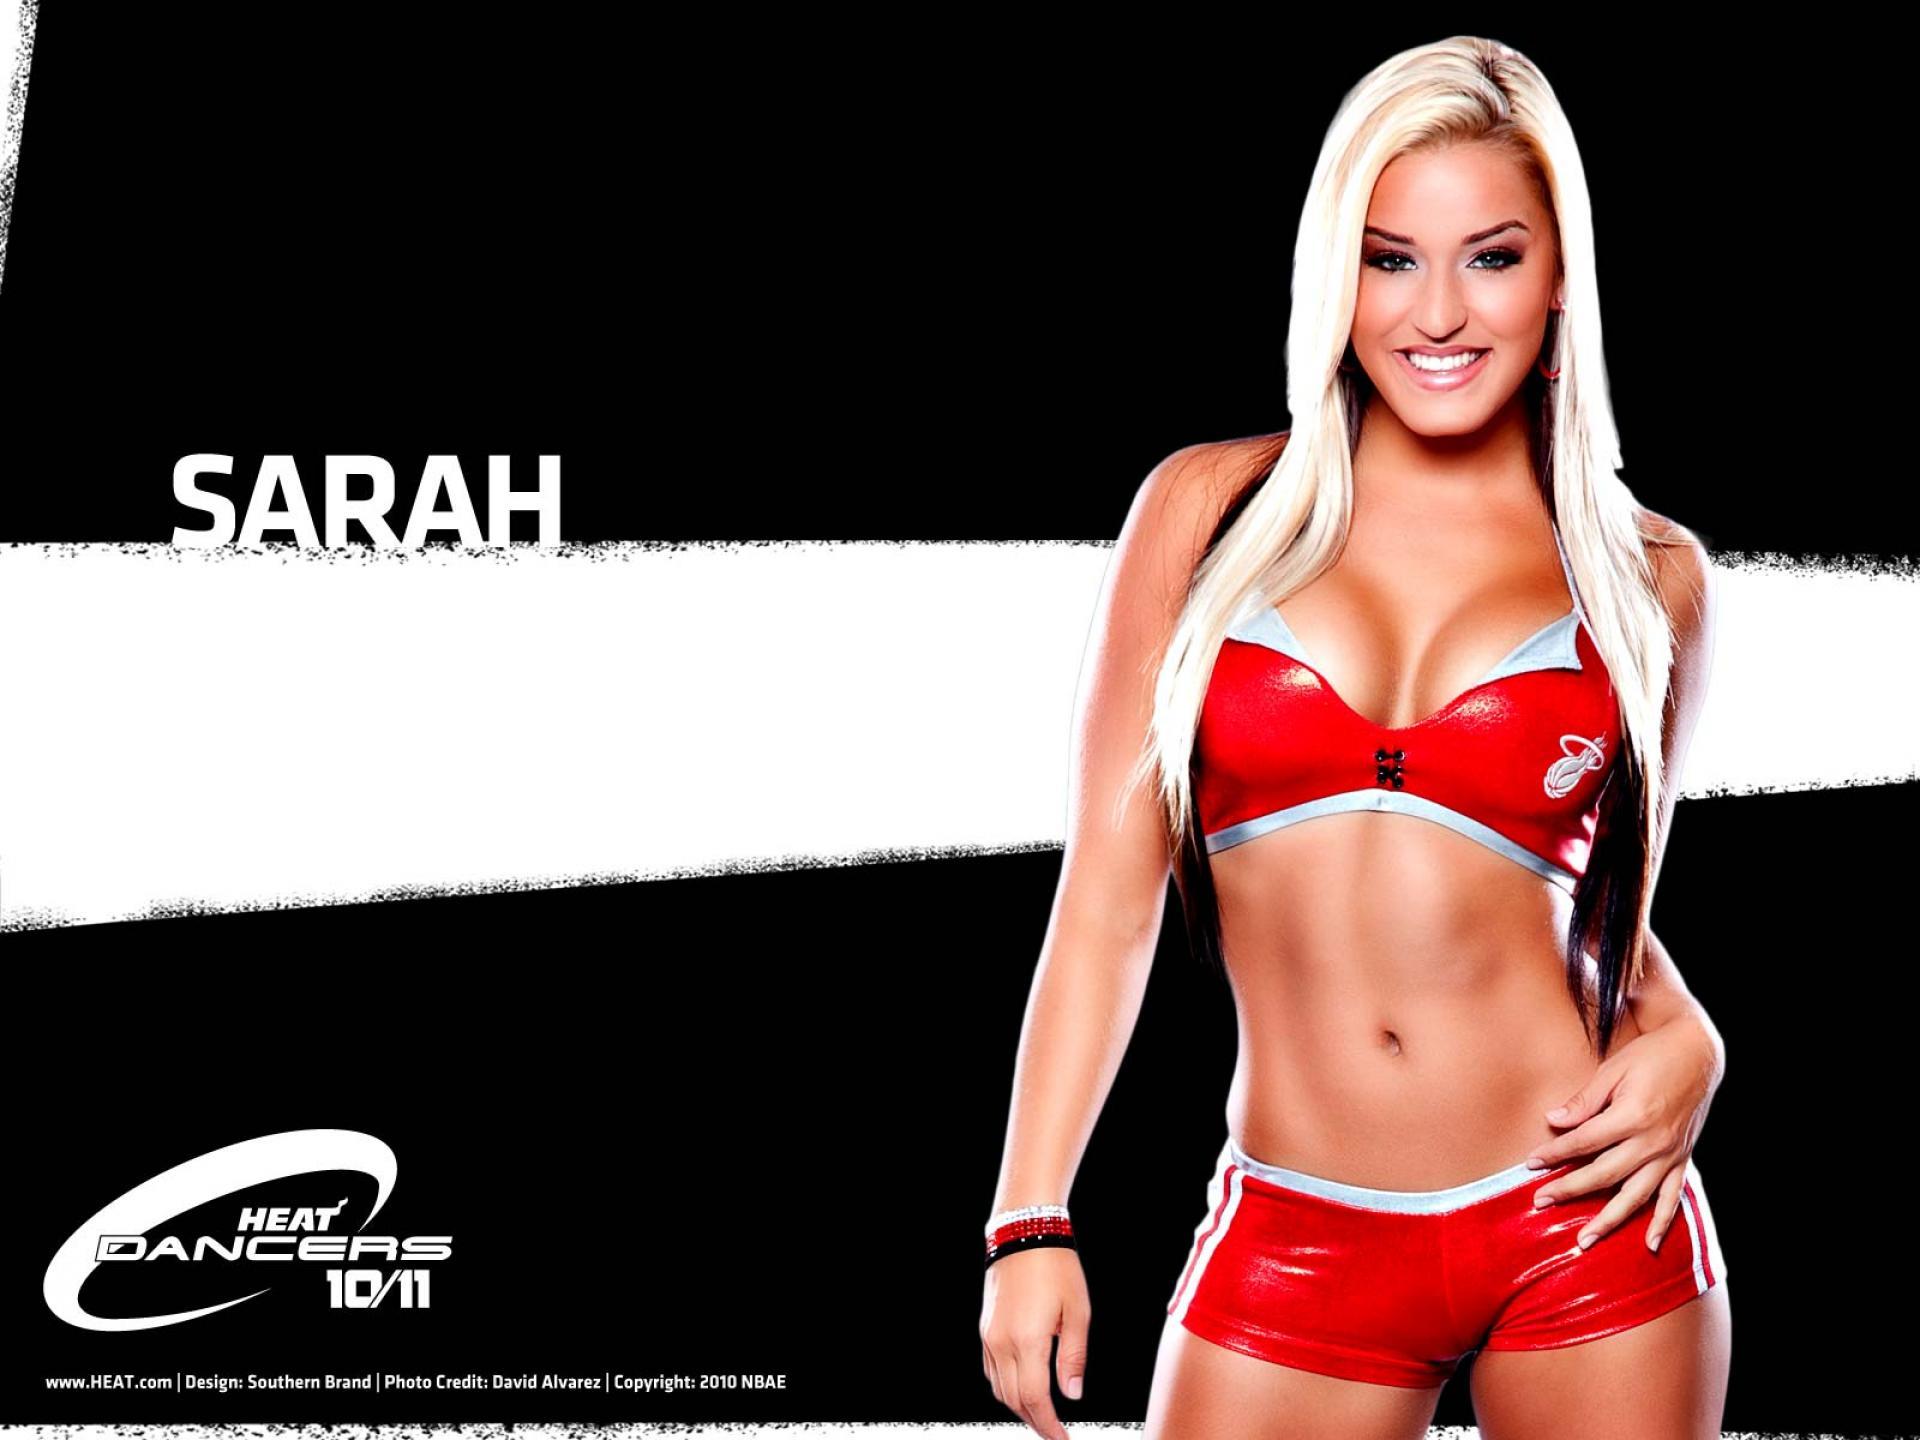 NBA Dancers   Miami Heat   sarah   United States  USA Pictures HD Wallpaper